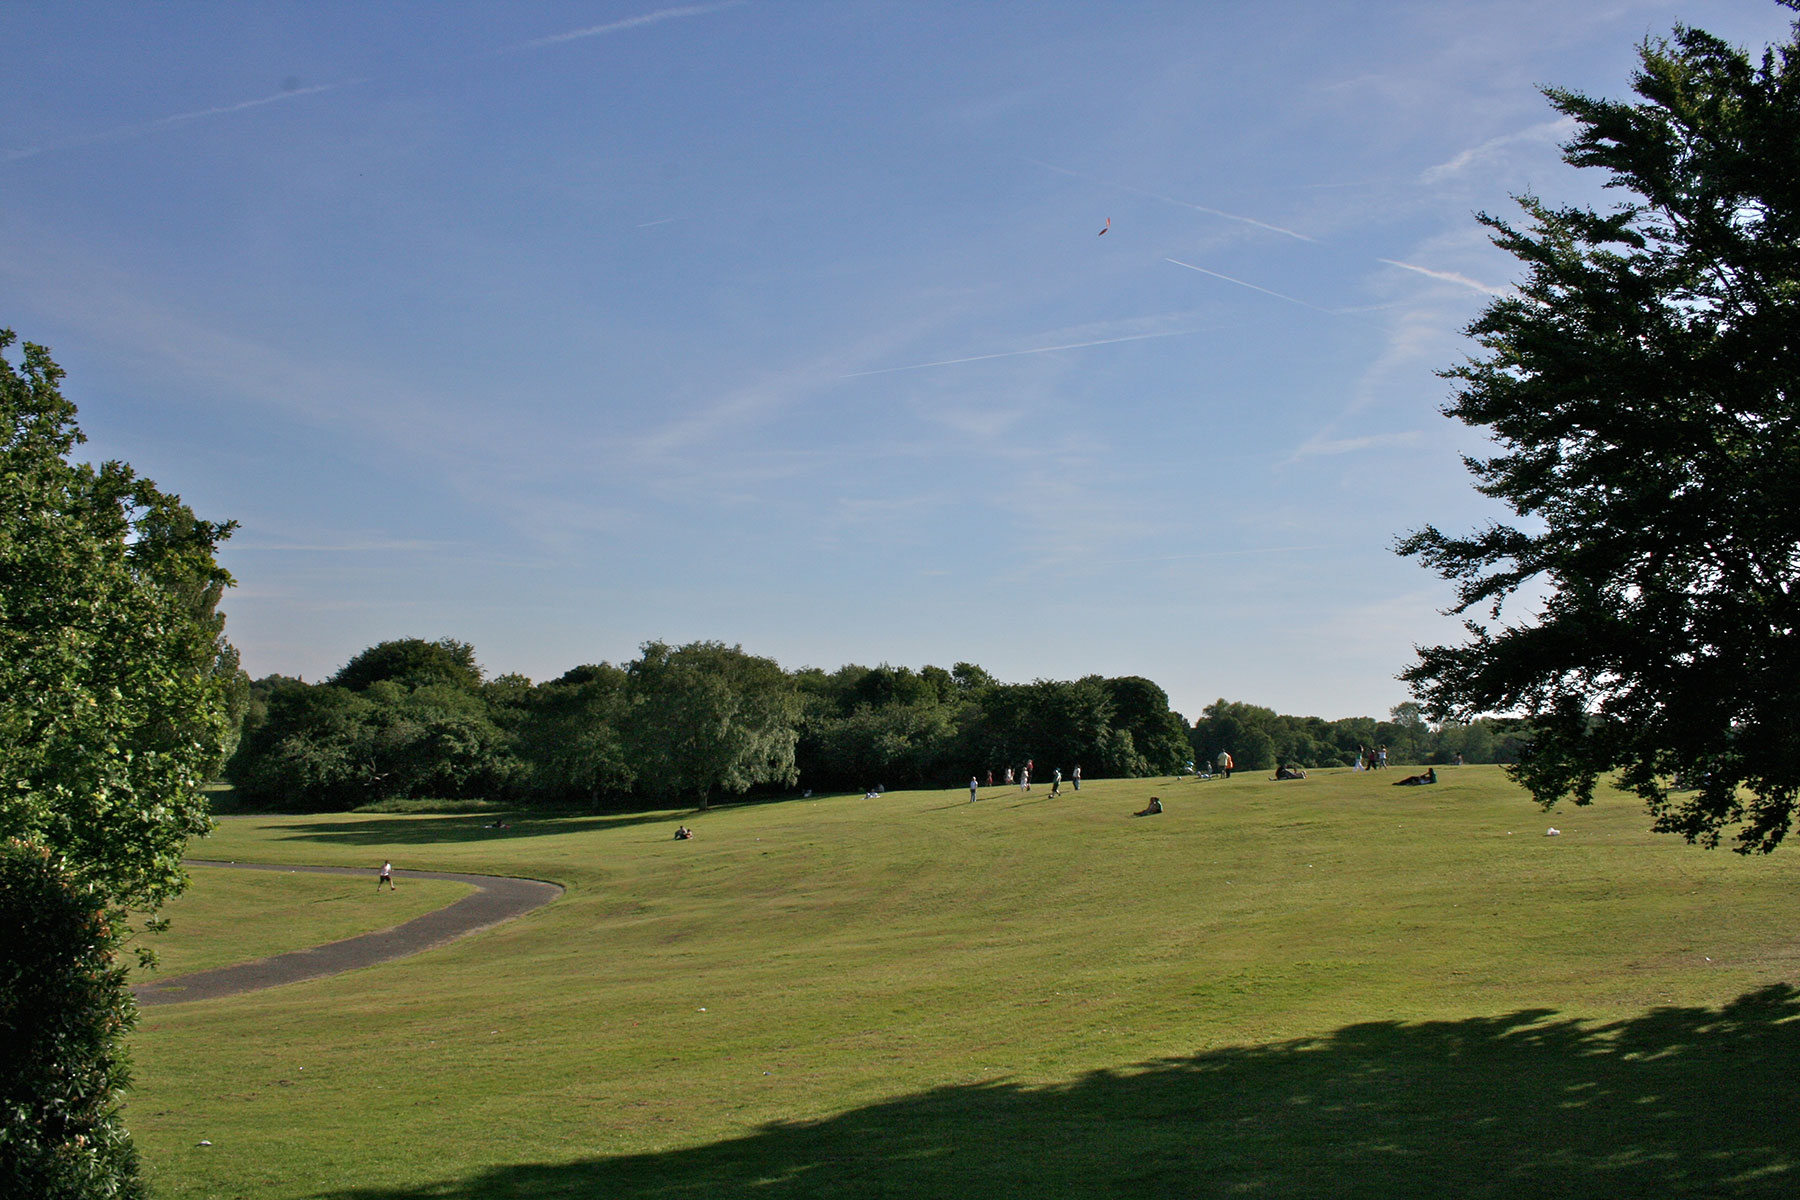 Heaton Park, Manchester